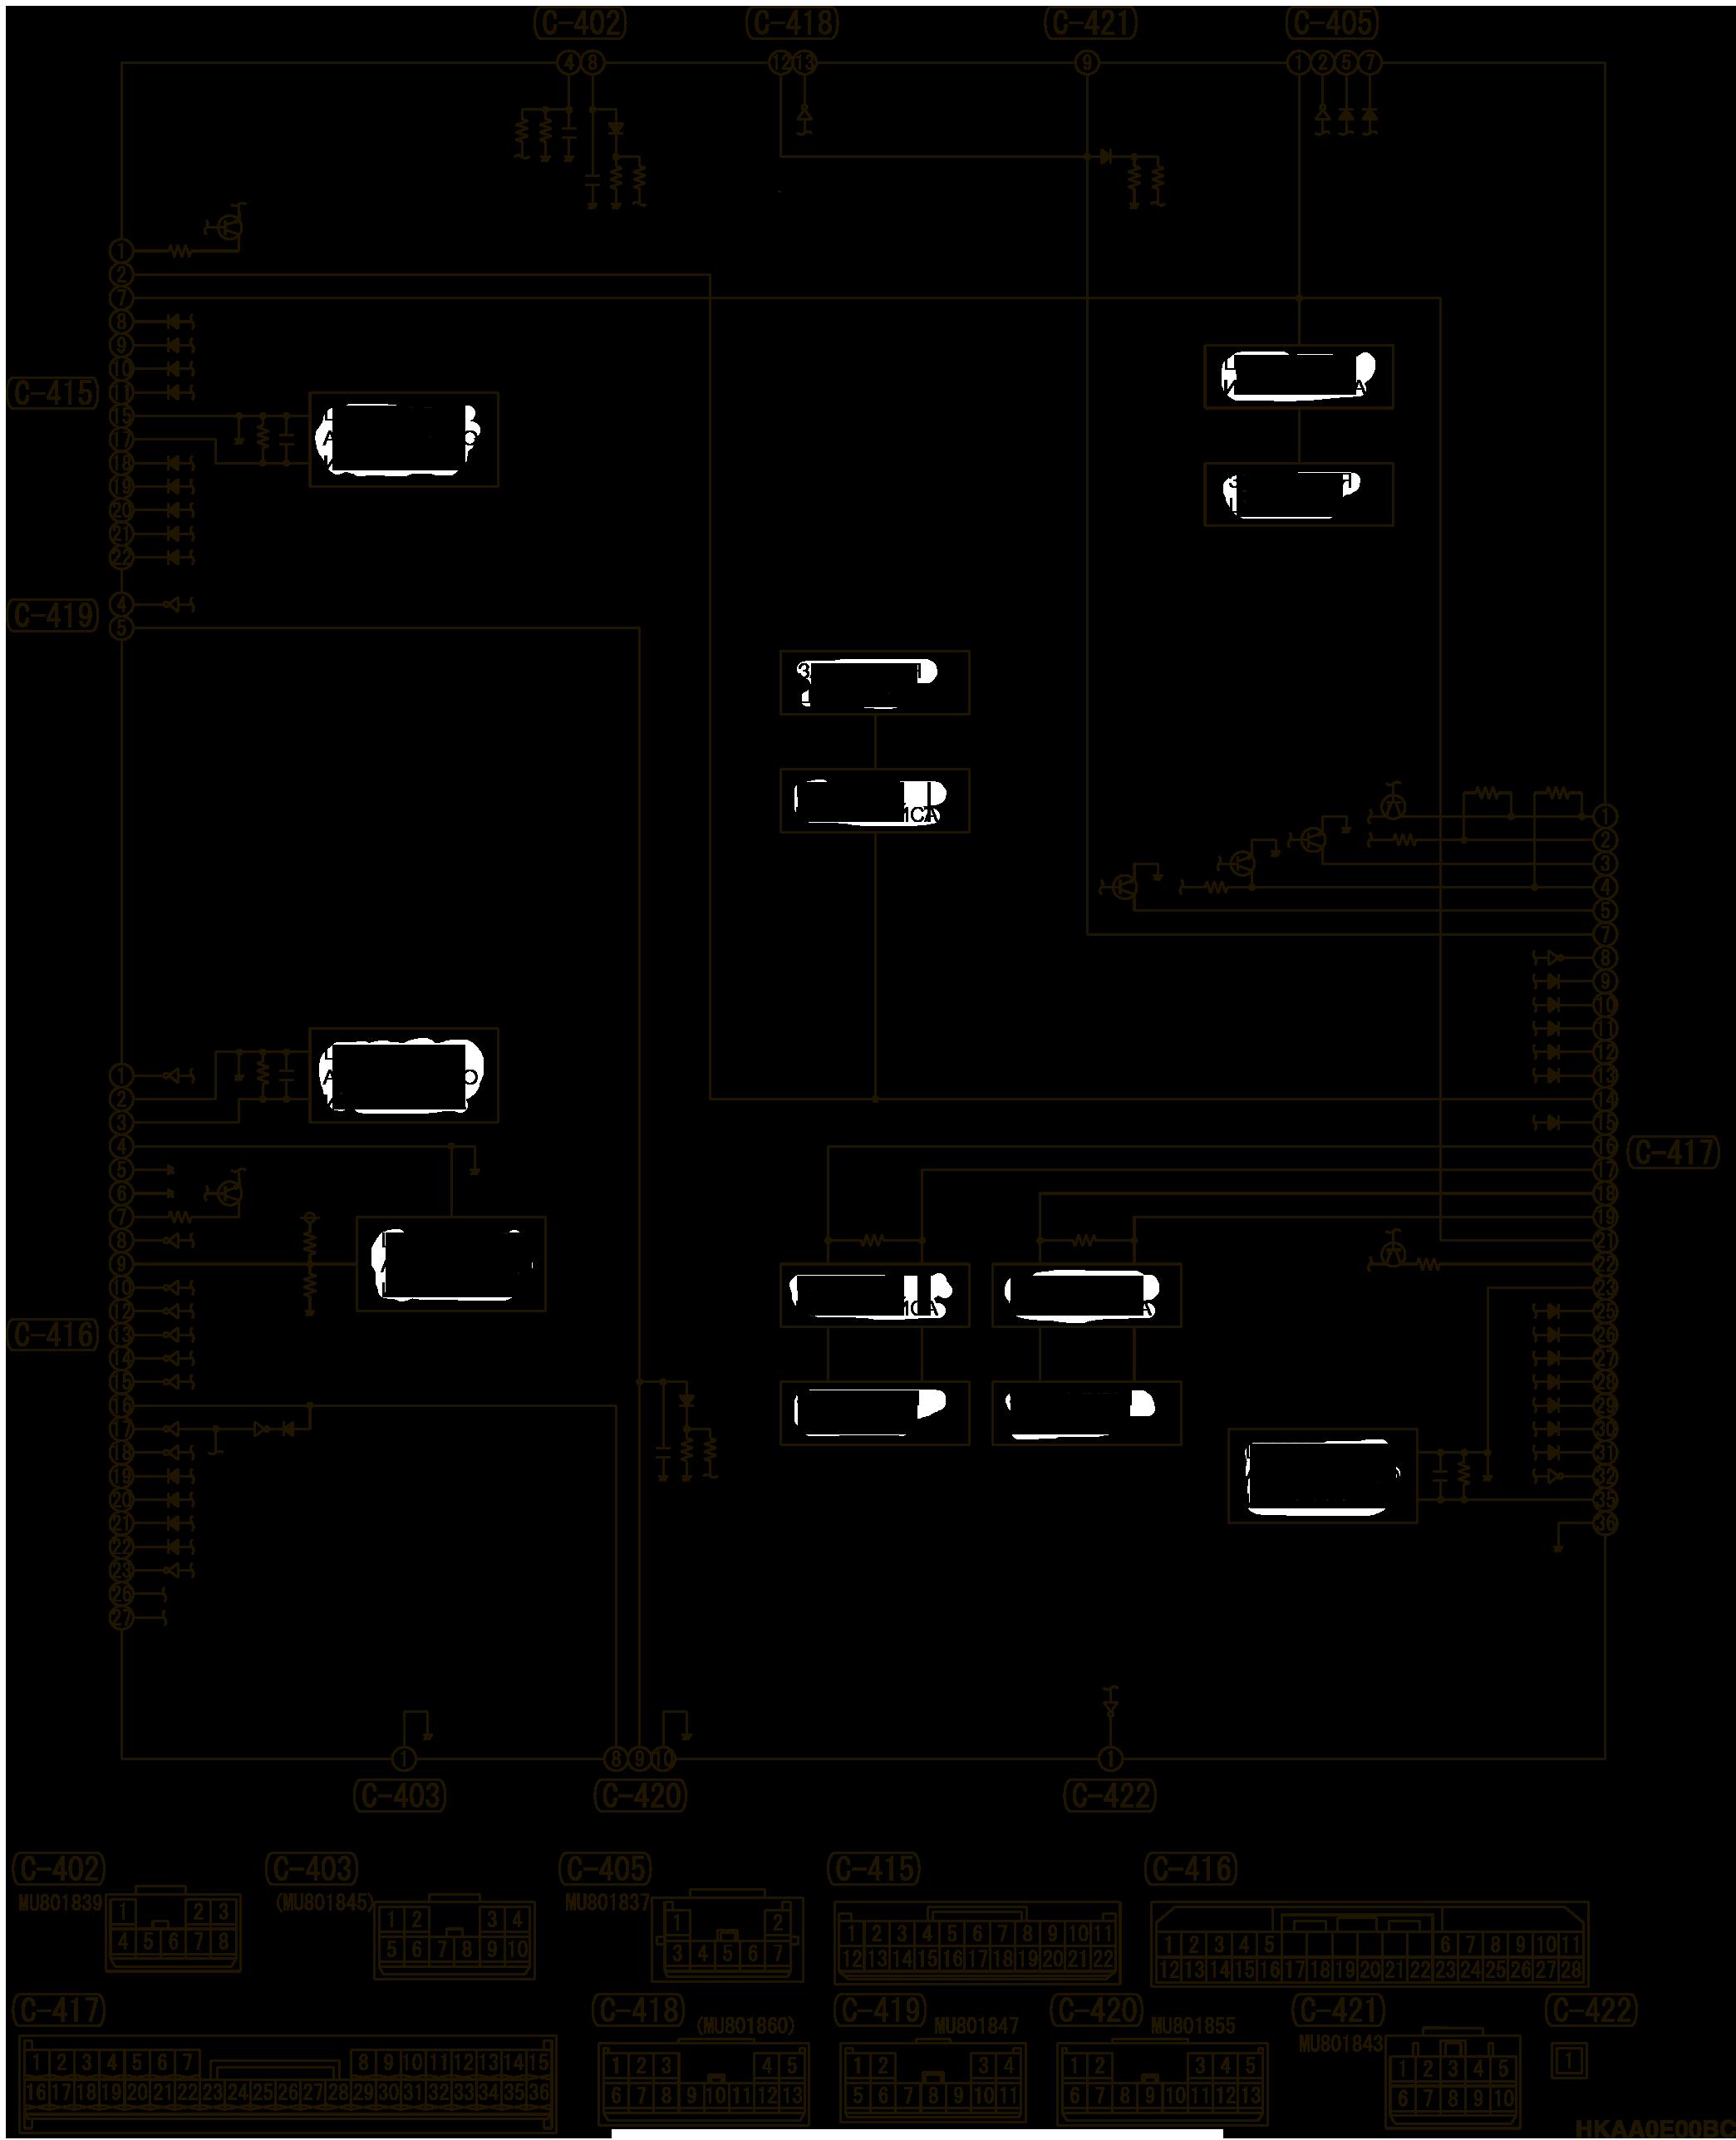 mmc аутлендер 3 2019 электросхемаЭБУ ETACS